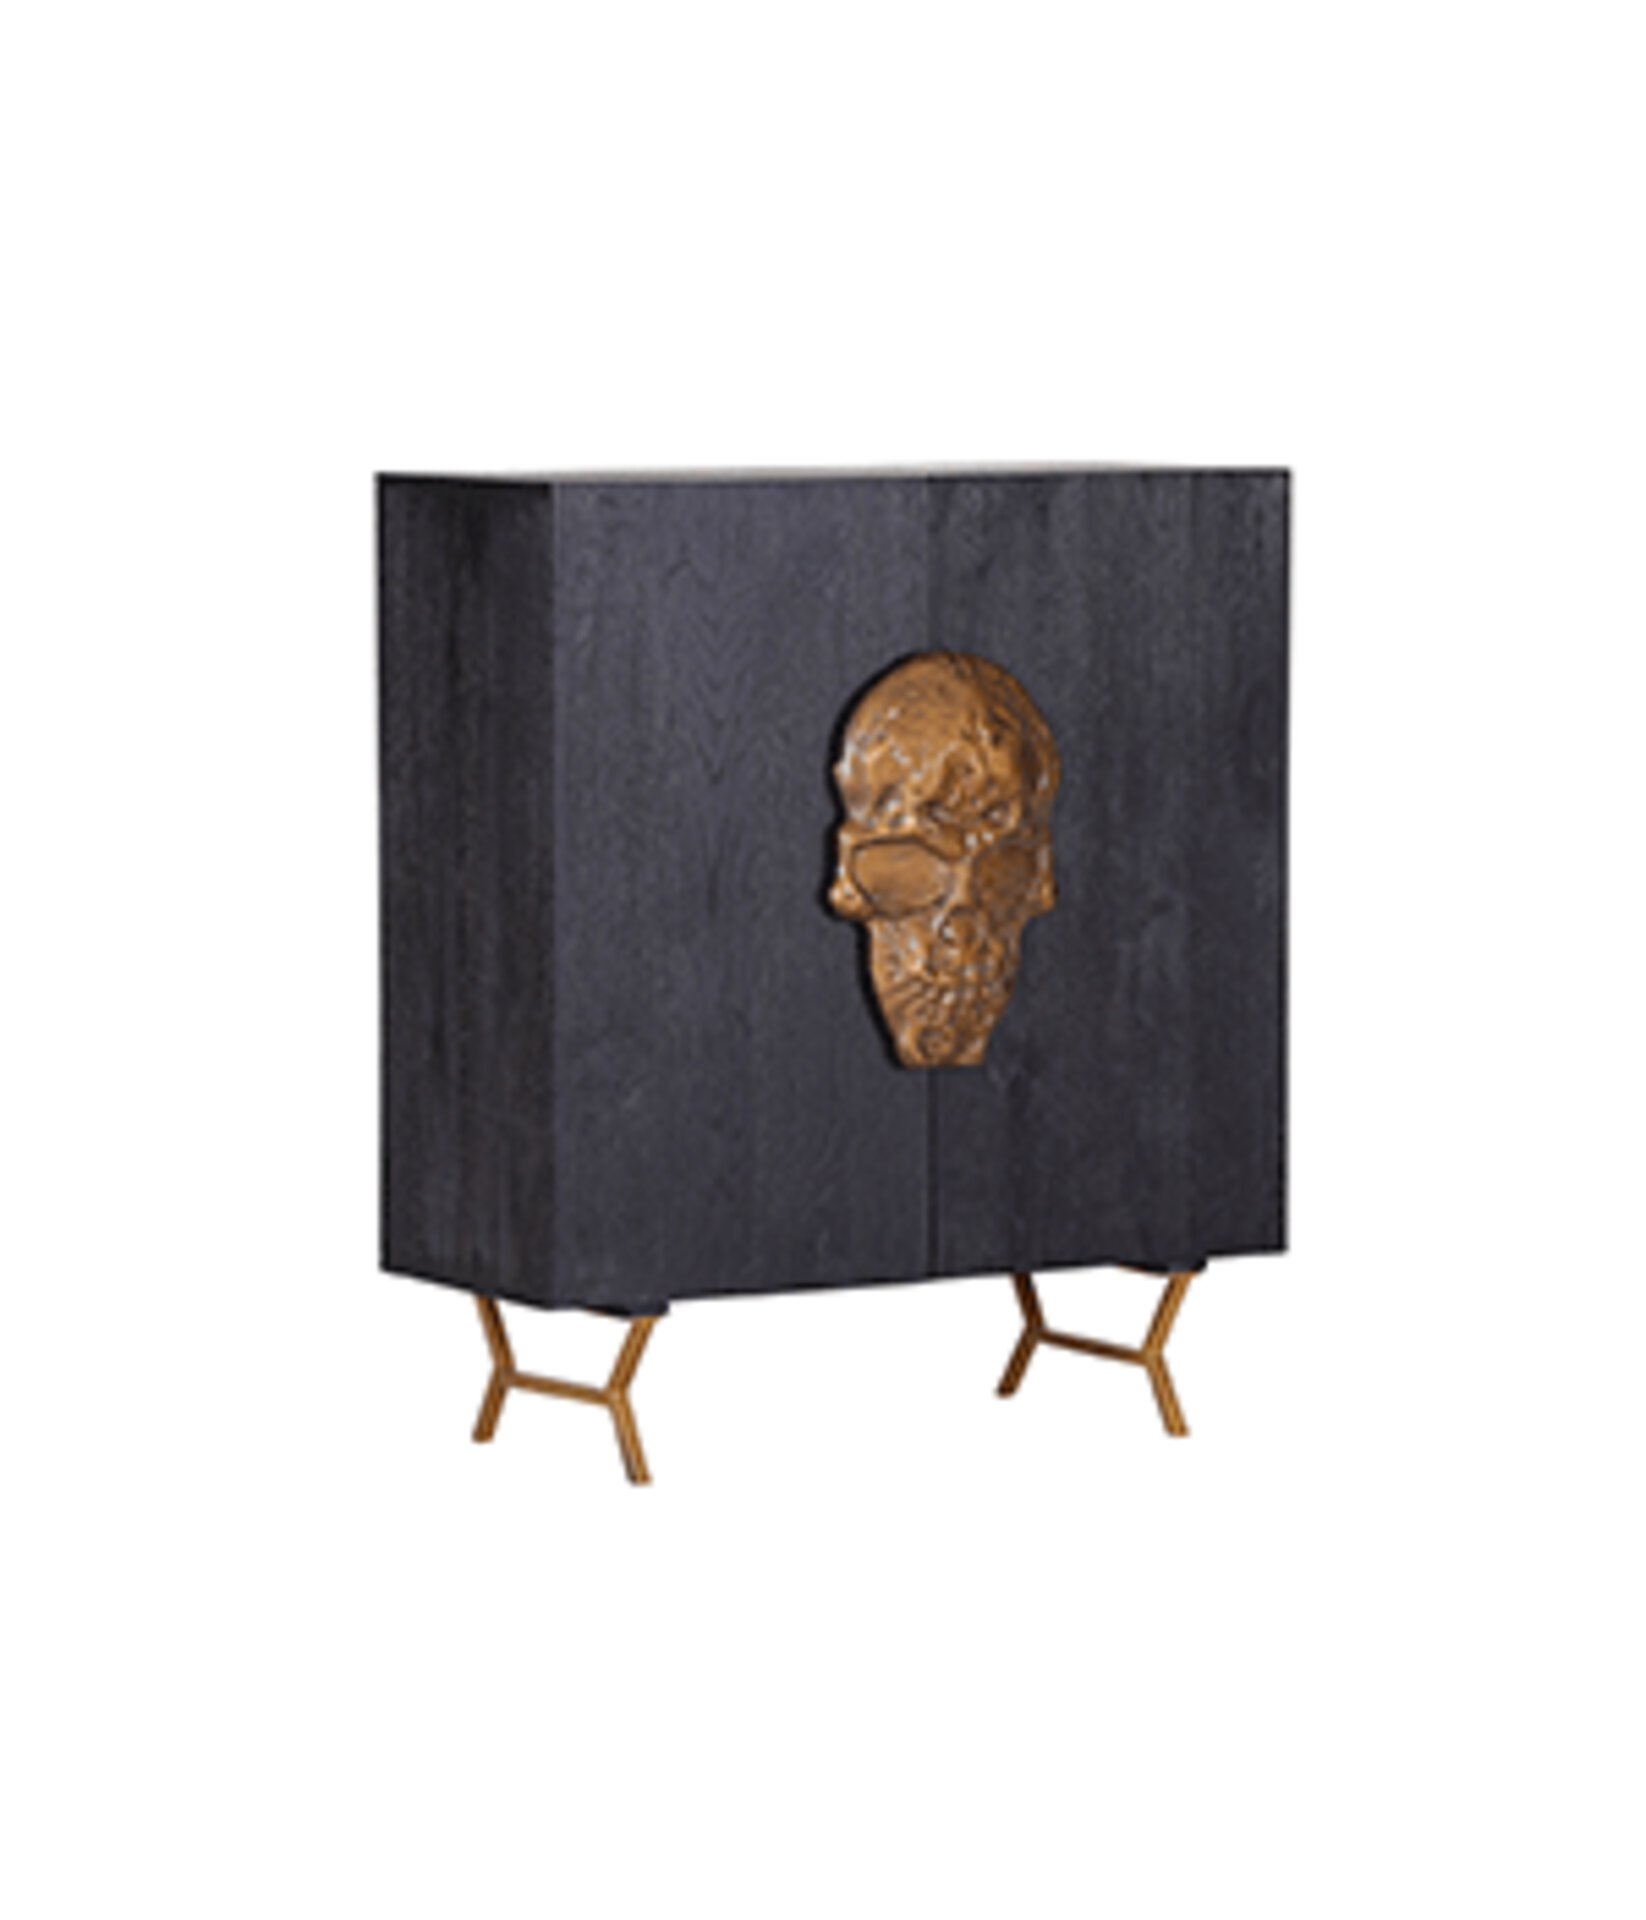 schwarze Kommode mit goldenem Totenkopf